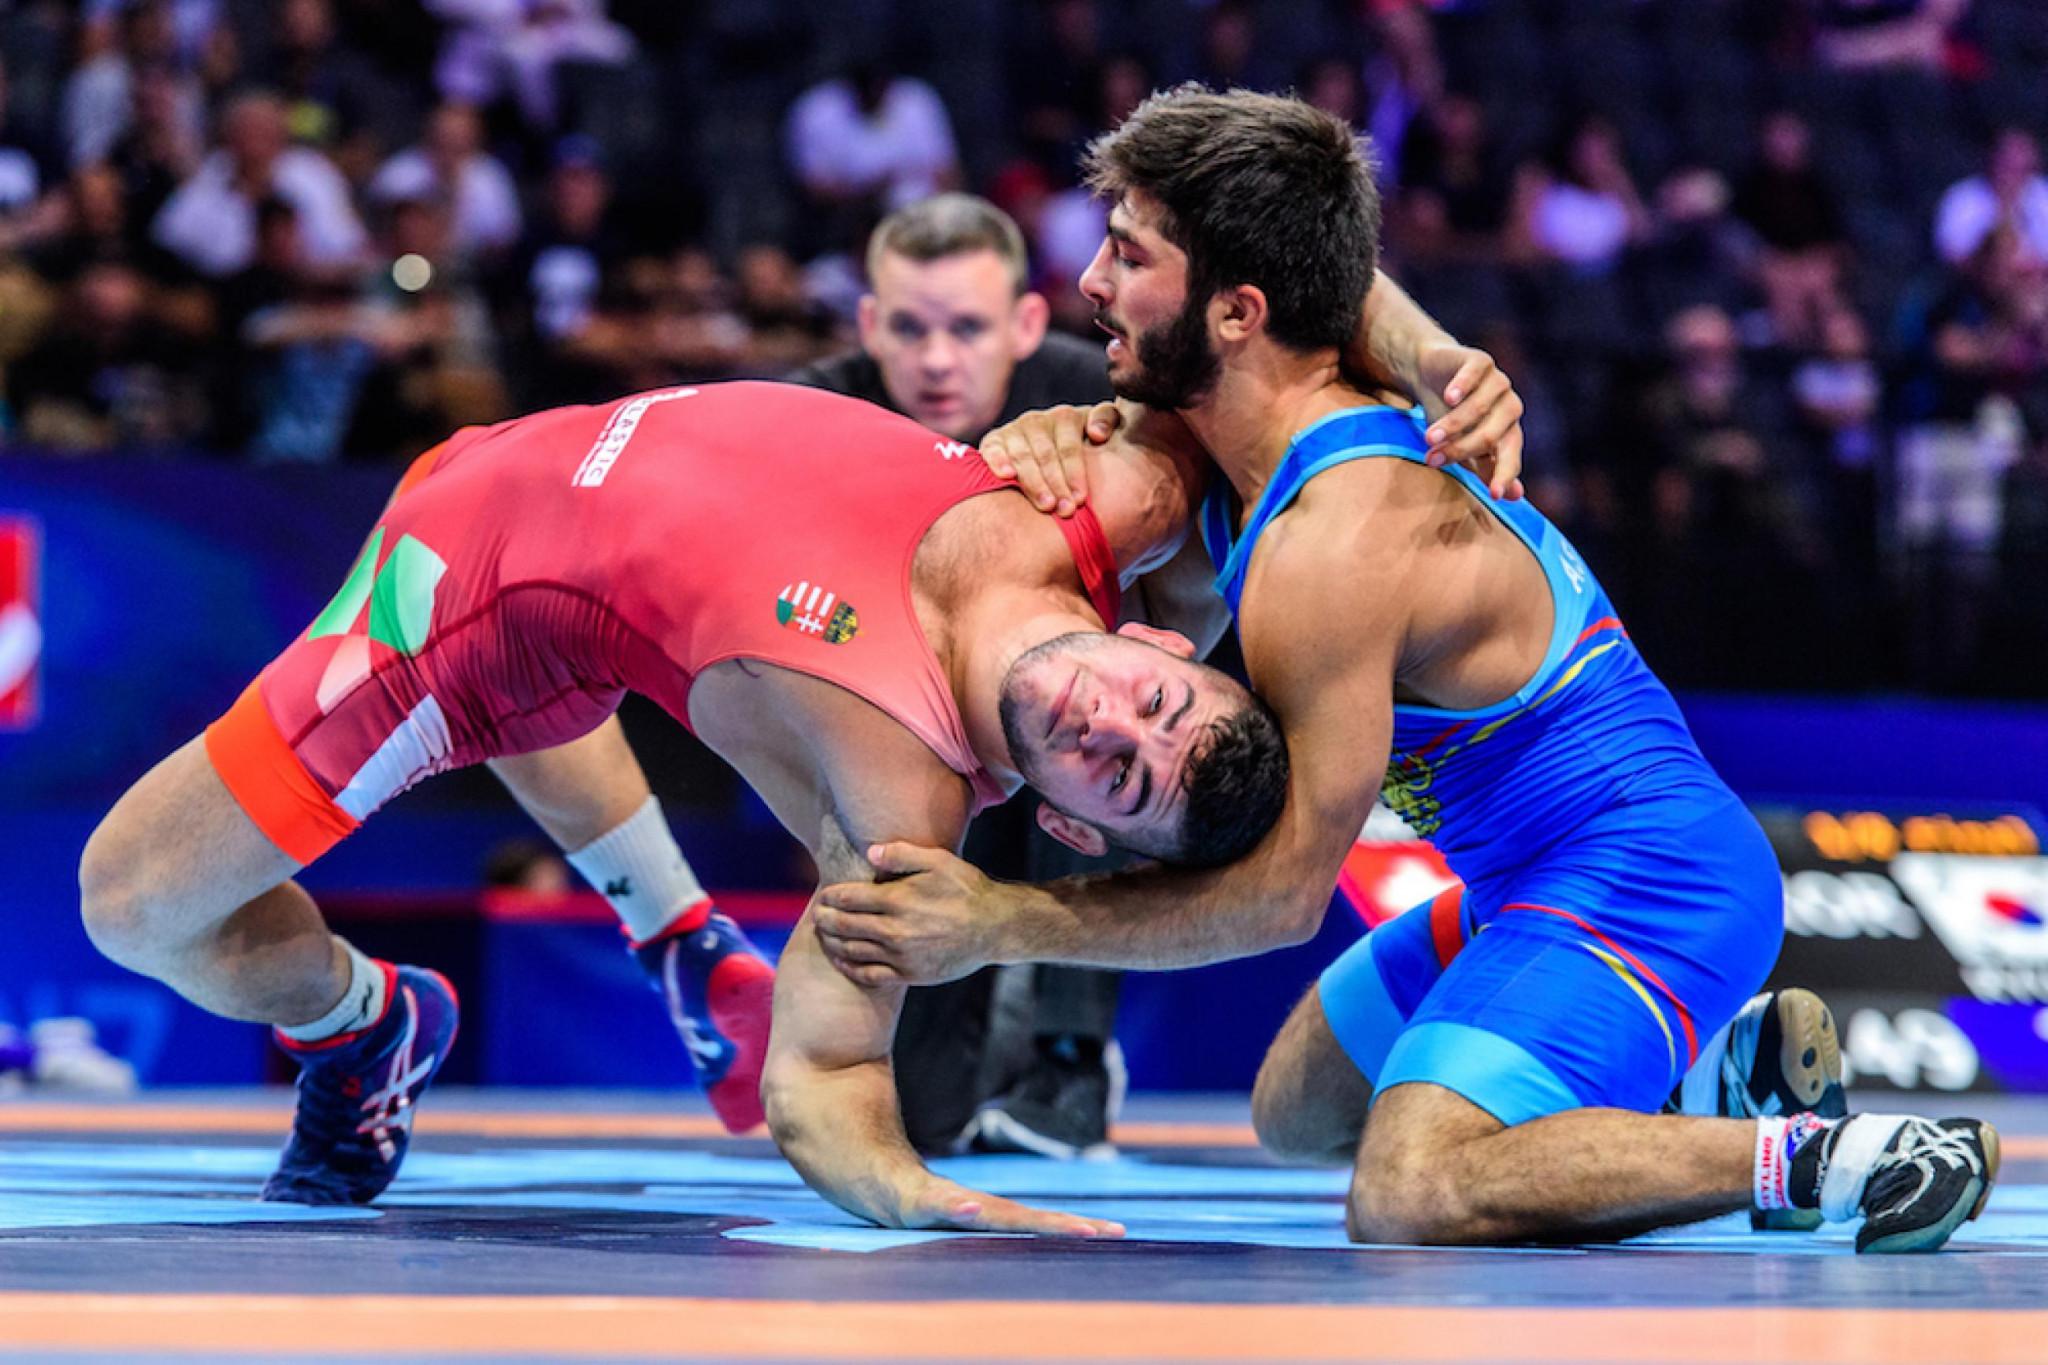 United World Wrestling announce seeds for 2018 World Championships